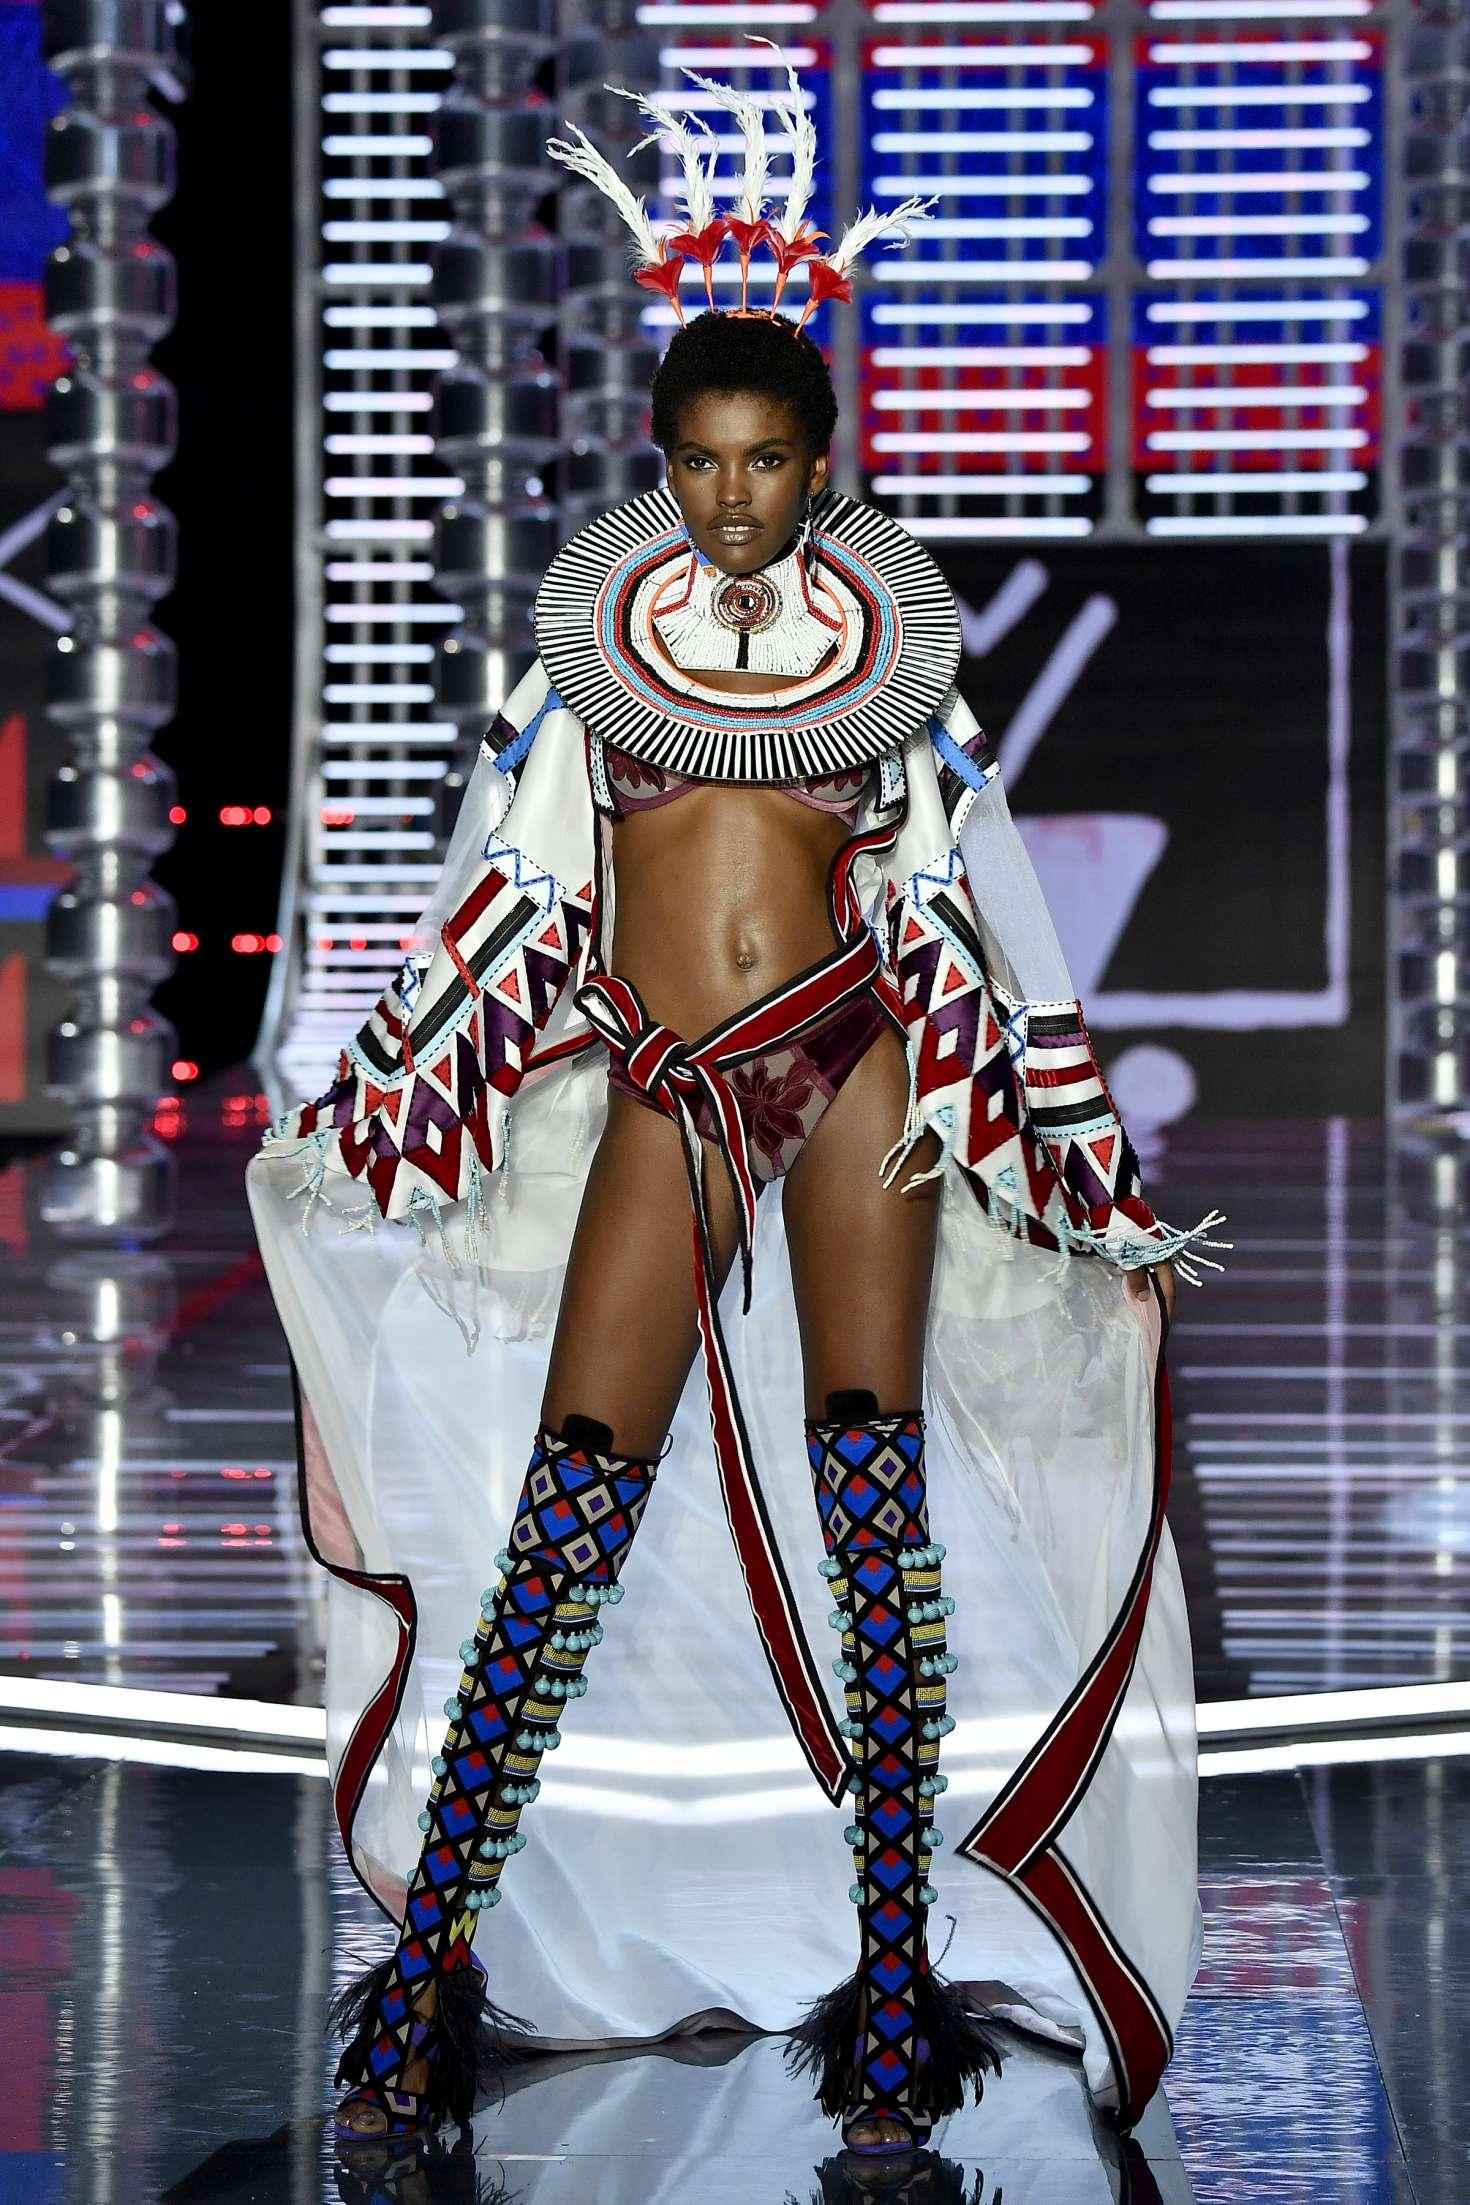 Amilna Estevao 2017 : Amilna Estevao: 2017 Victorias Secret Fashion Show Runway -02